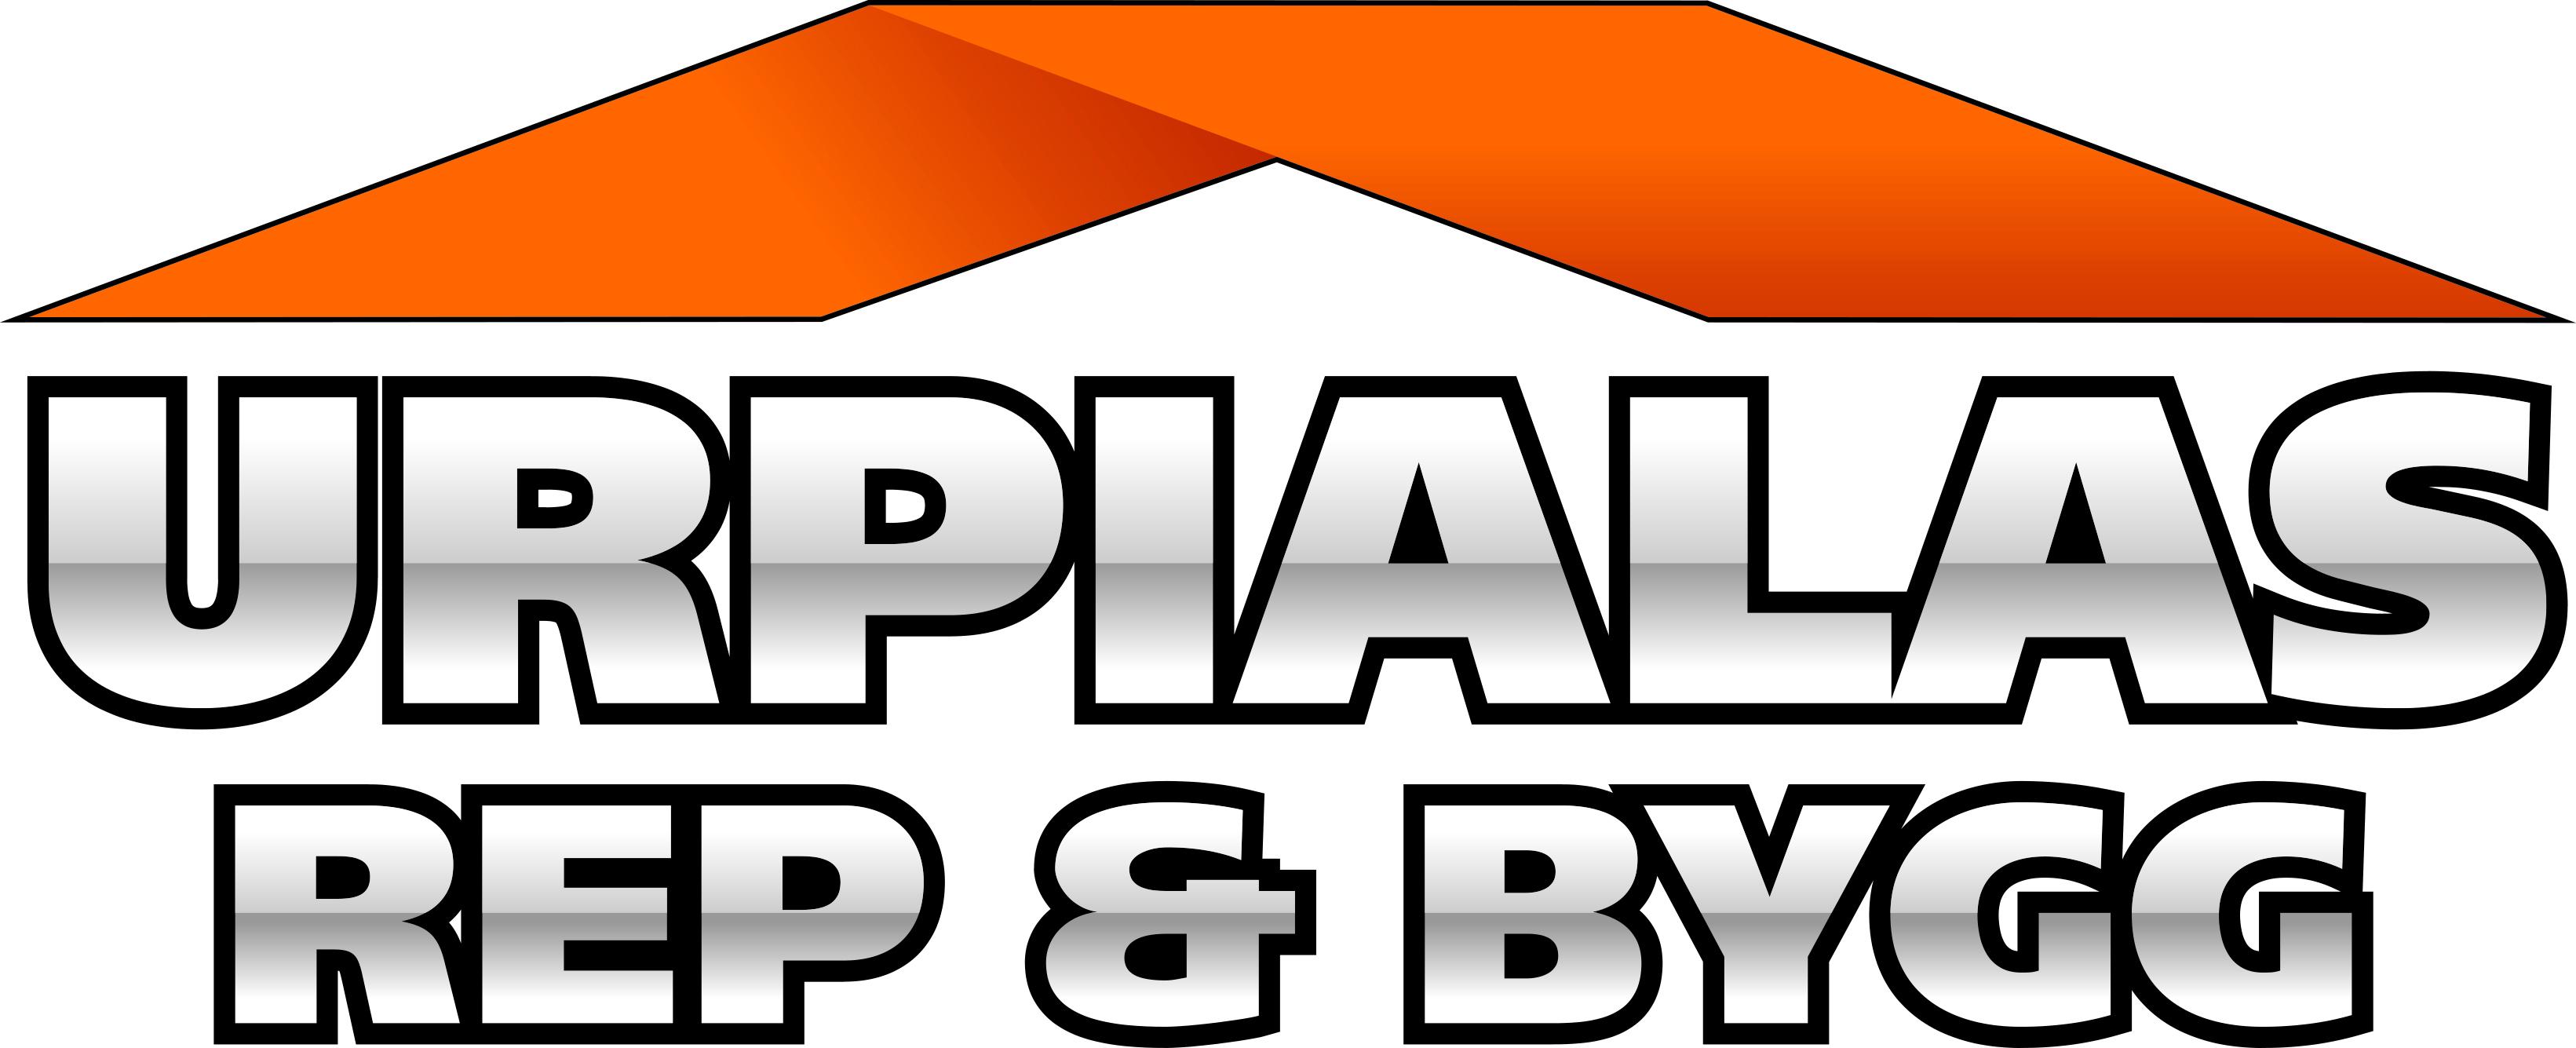 Urpiala Rep & Bygg